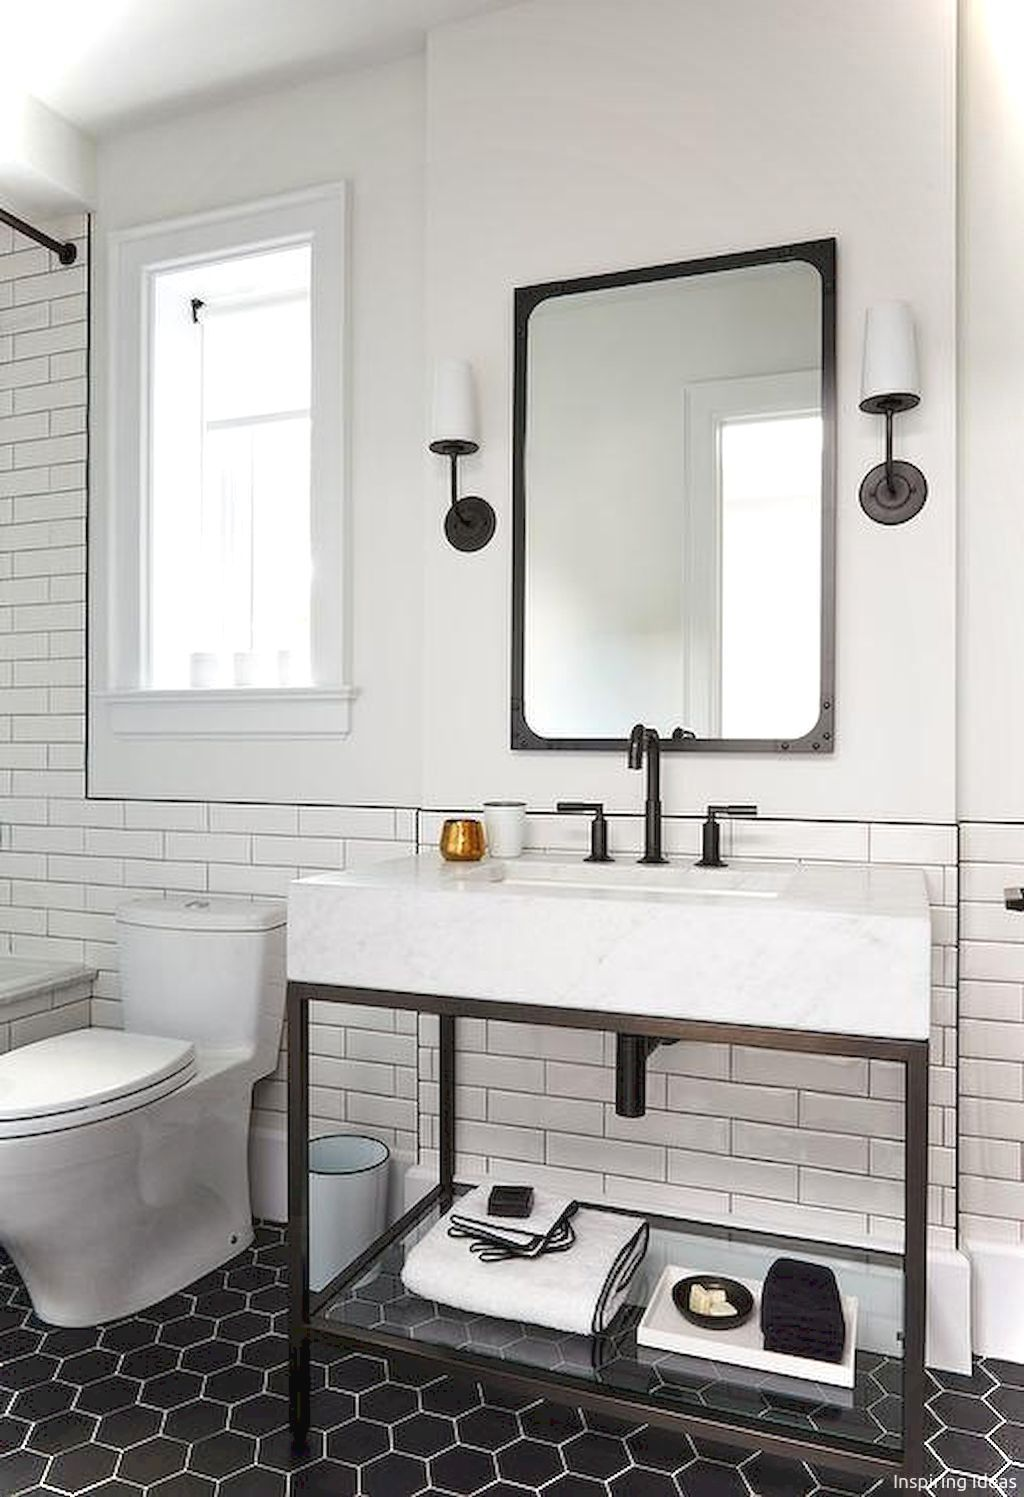 56 black and white bathroom design ideas   Bathroom ideas ...